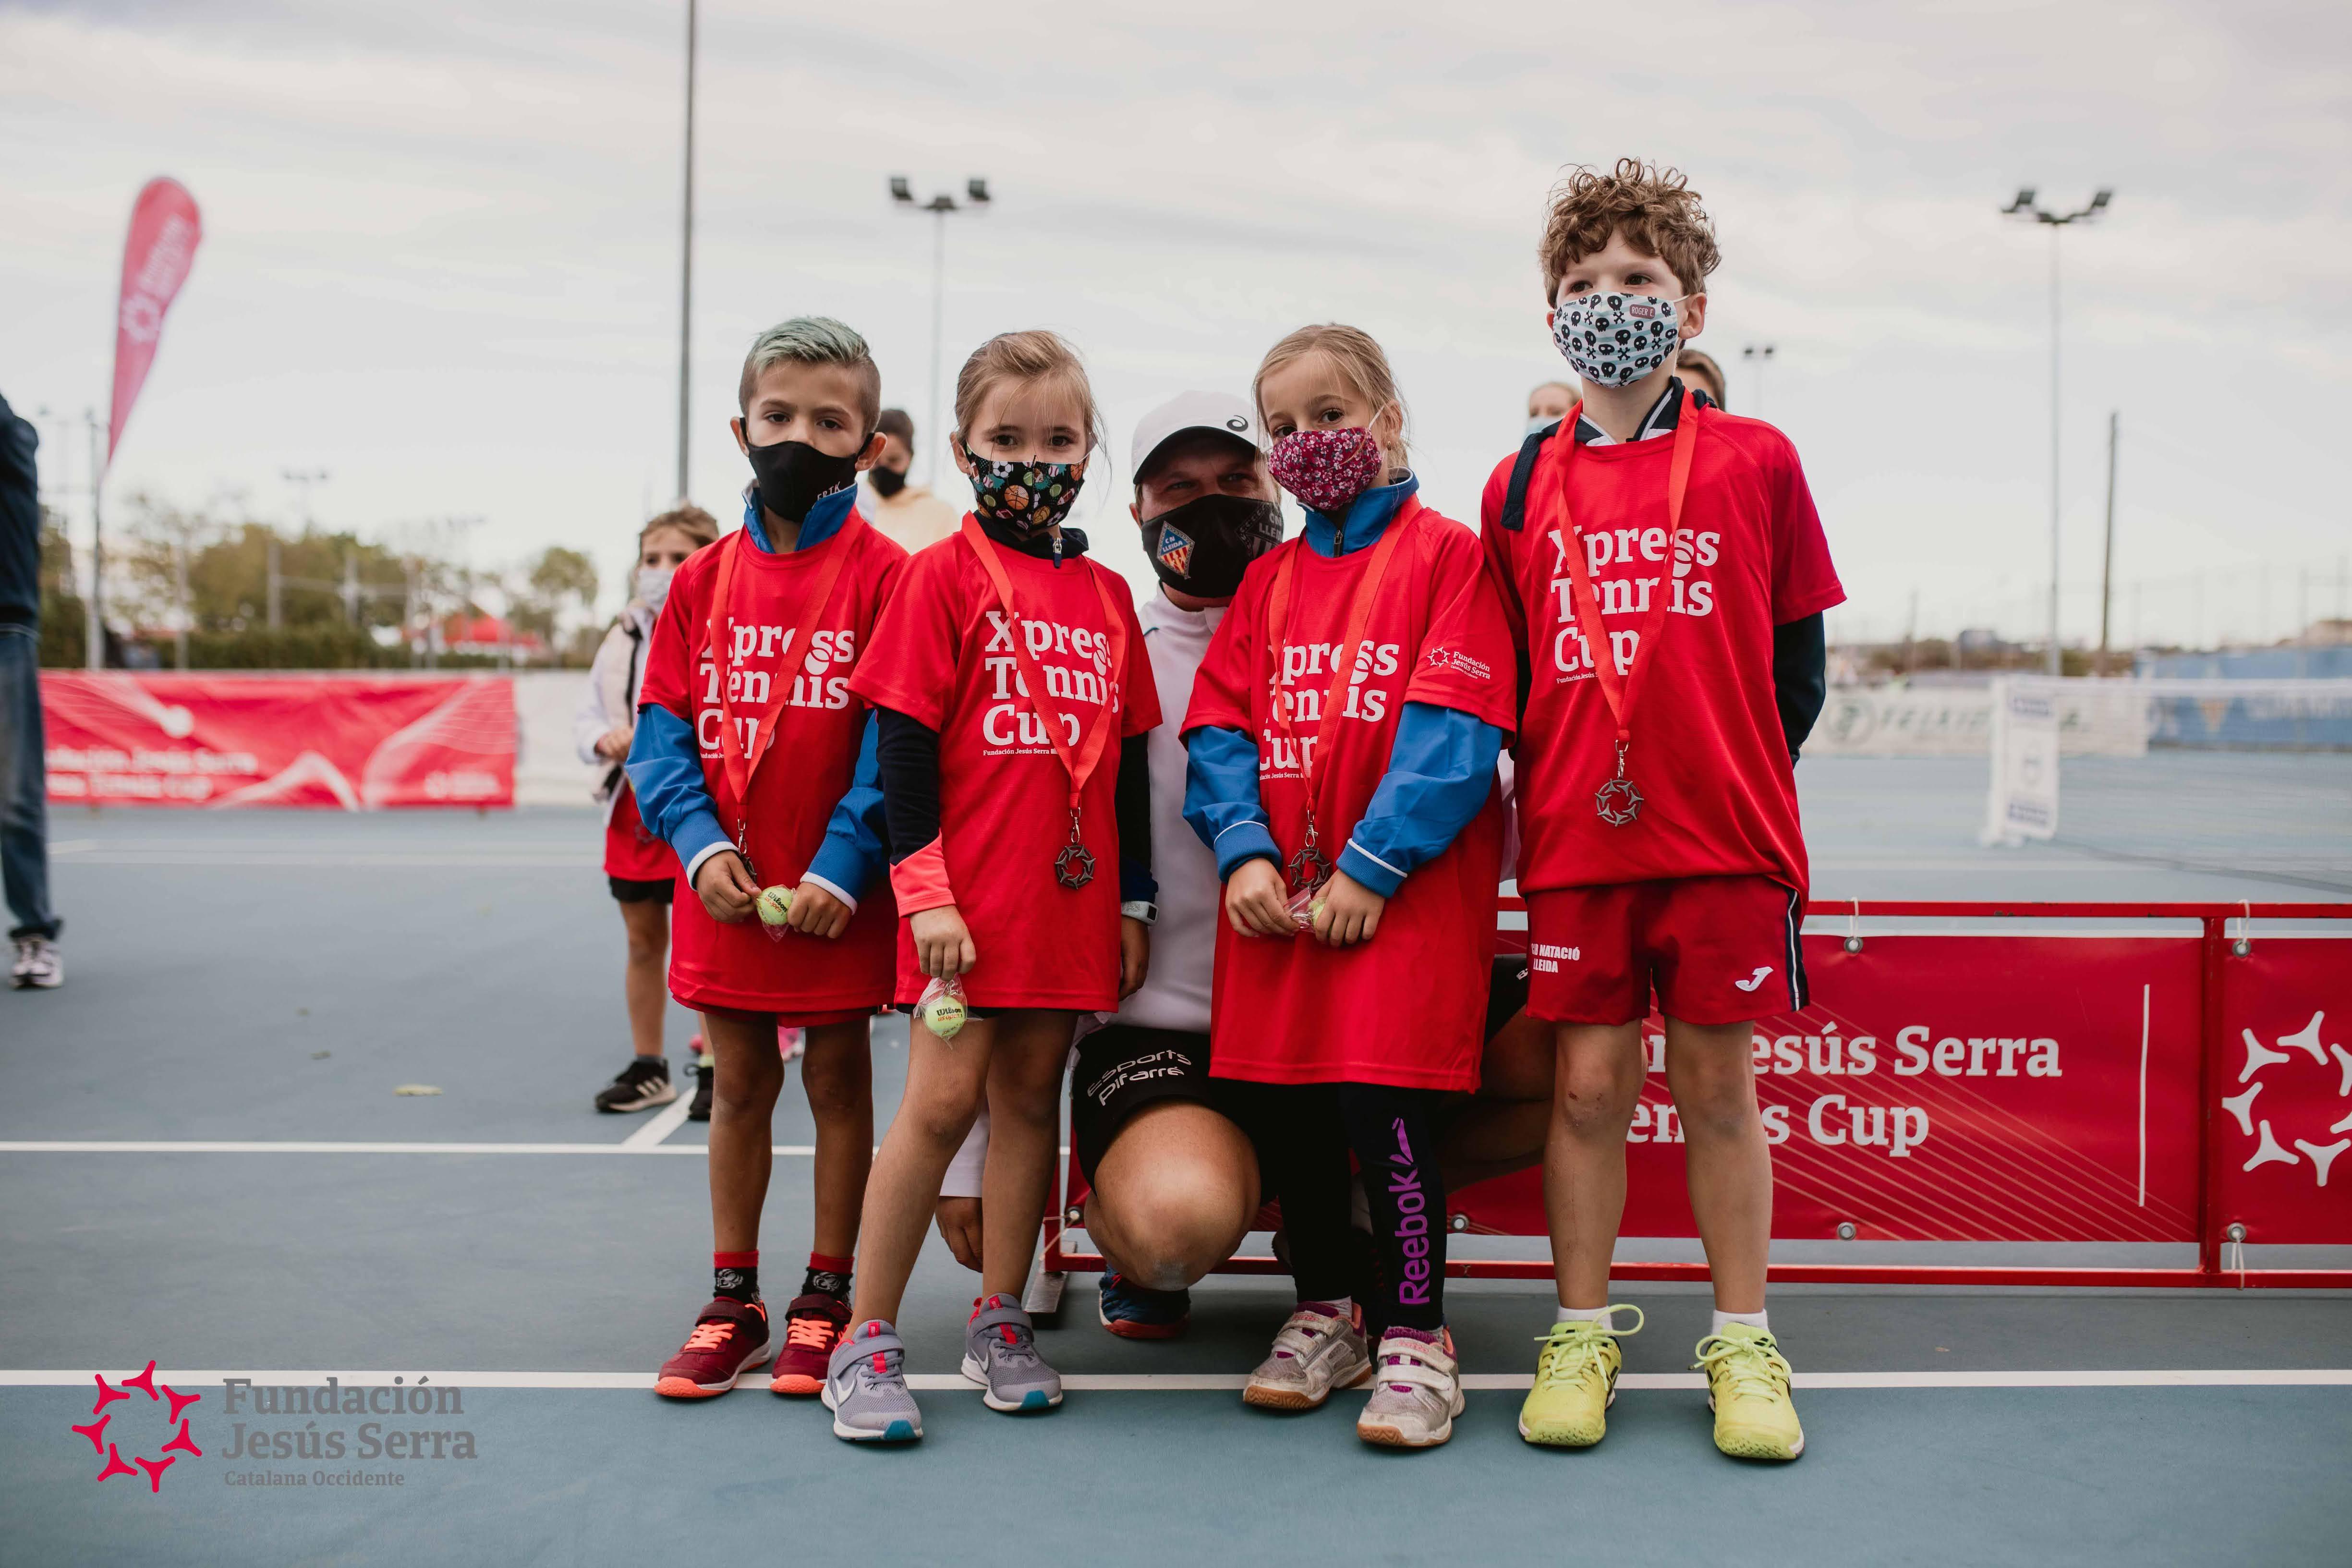 Xpress Tennis Cup 2020